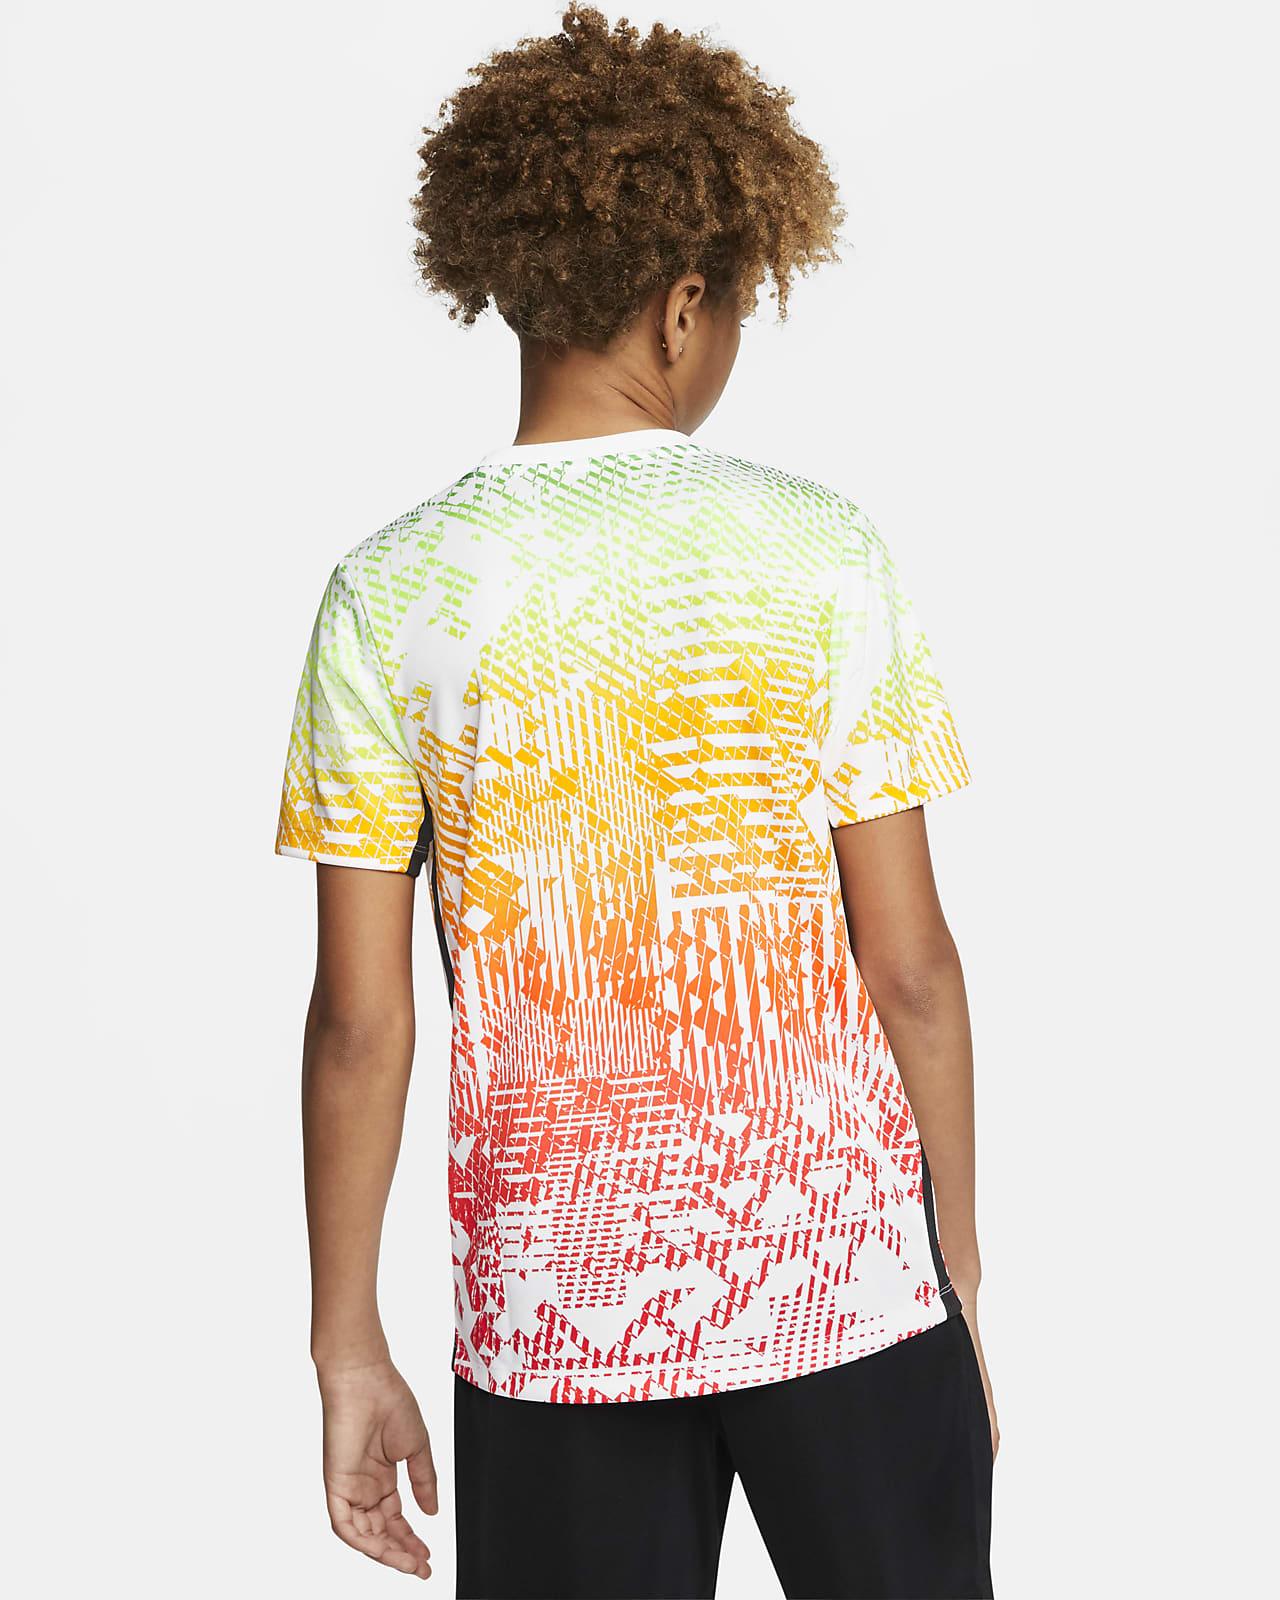 Nike Dri-Fit Neymar Jr Junior Ragazzi Calcio Formazione T Shirt Top Bianco//Multi